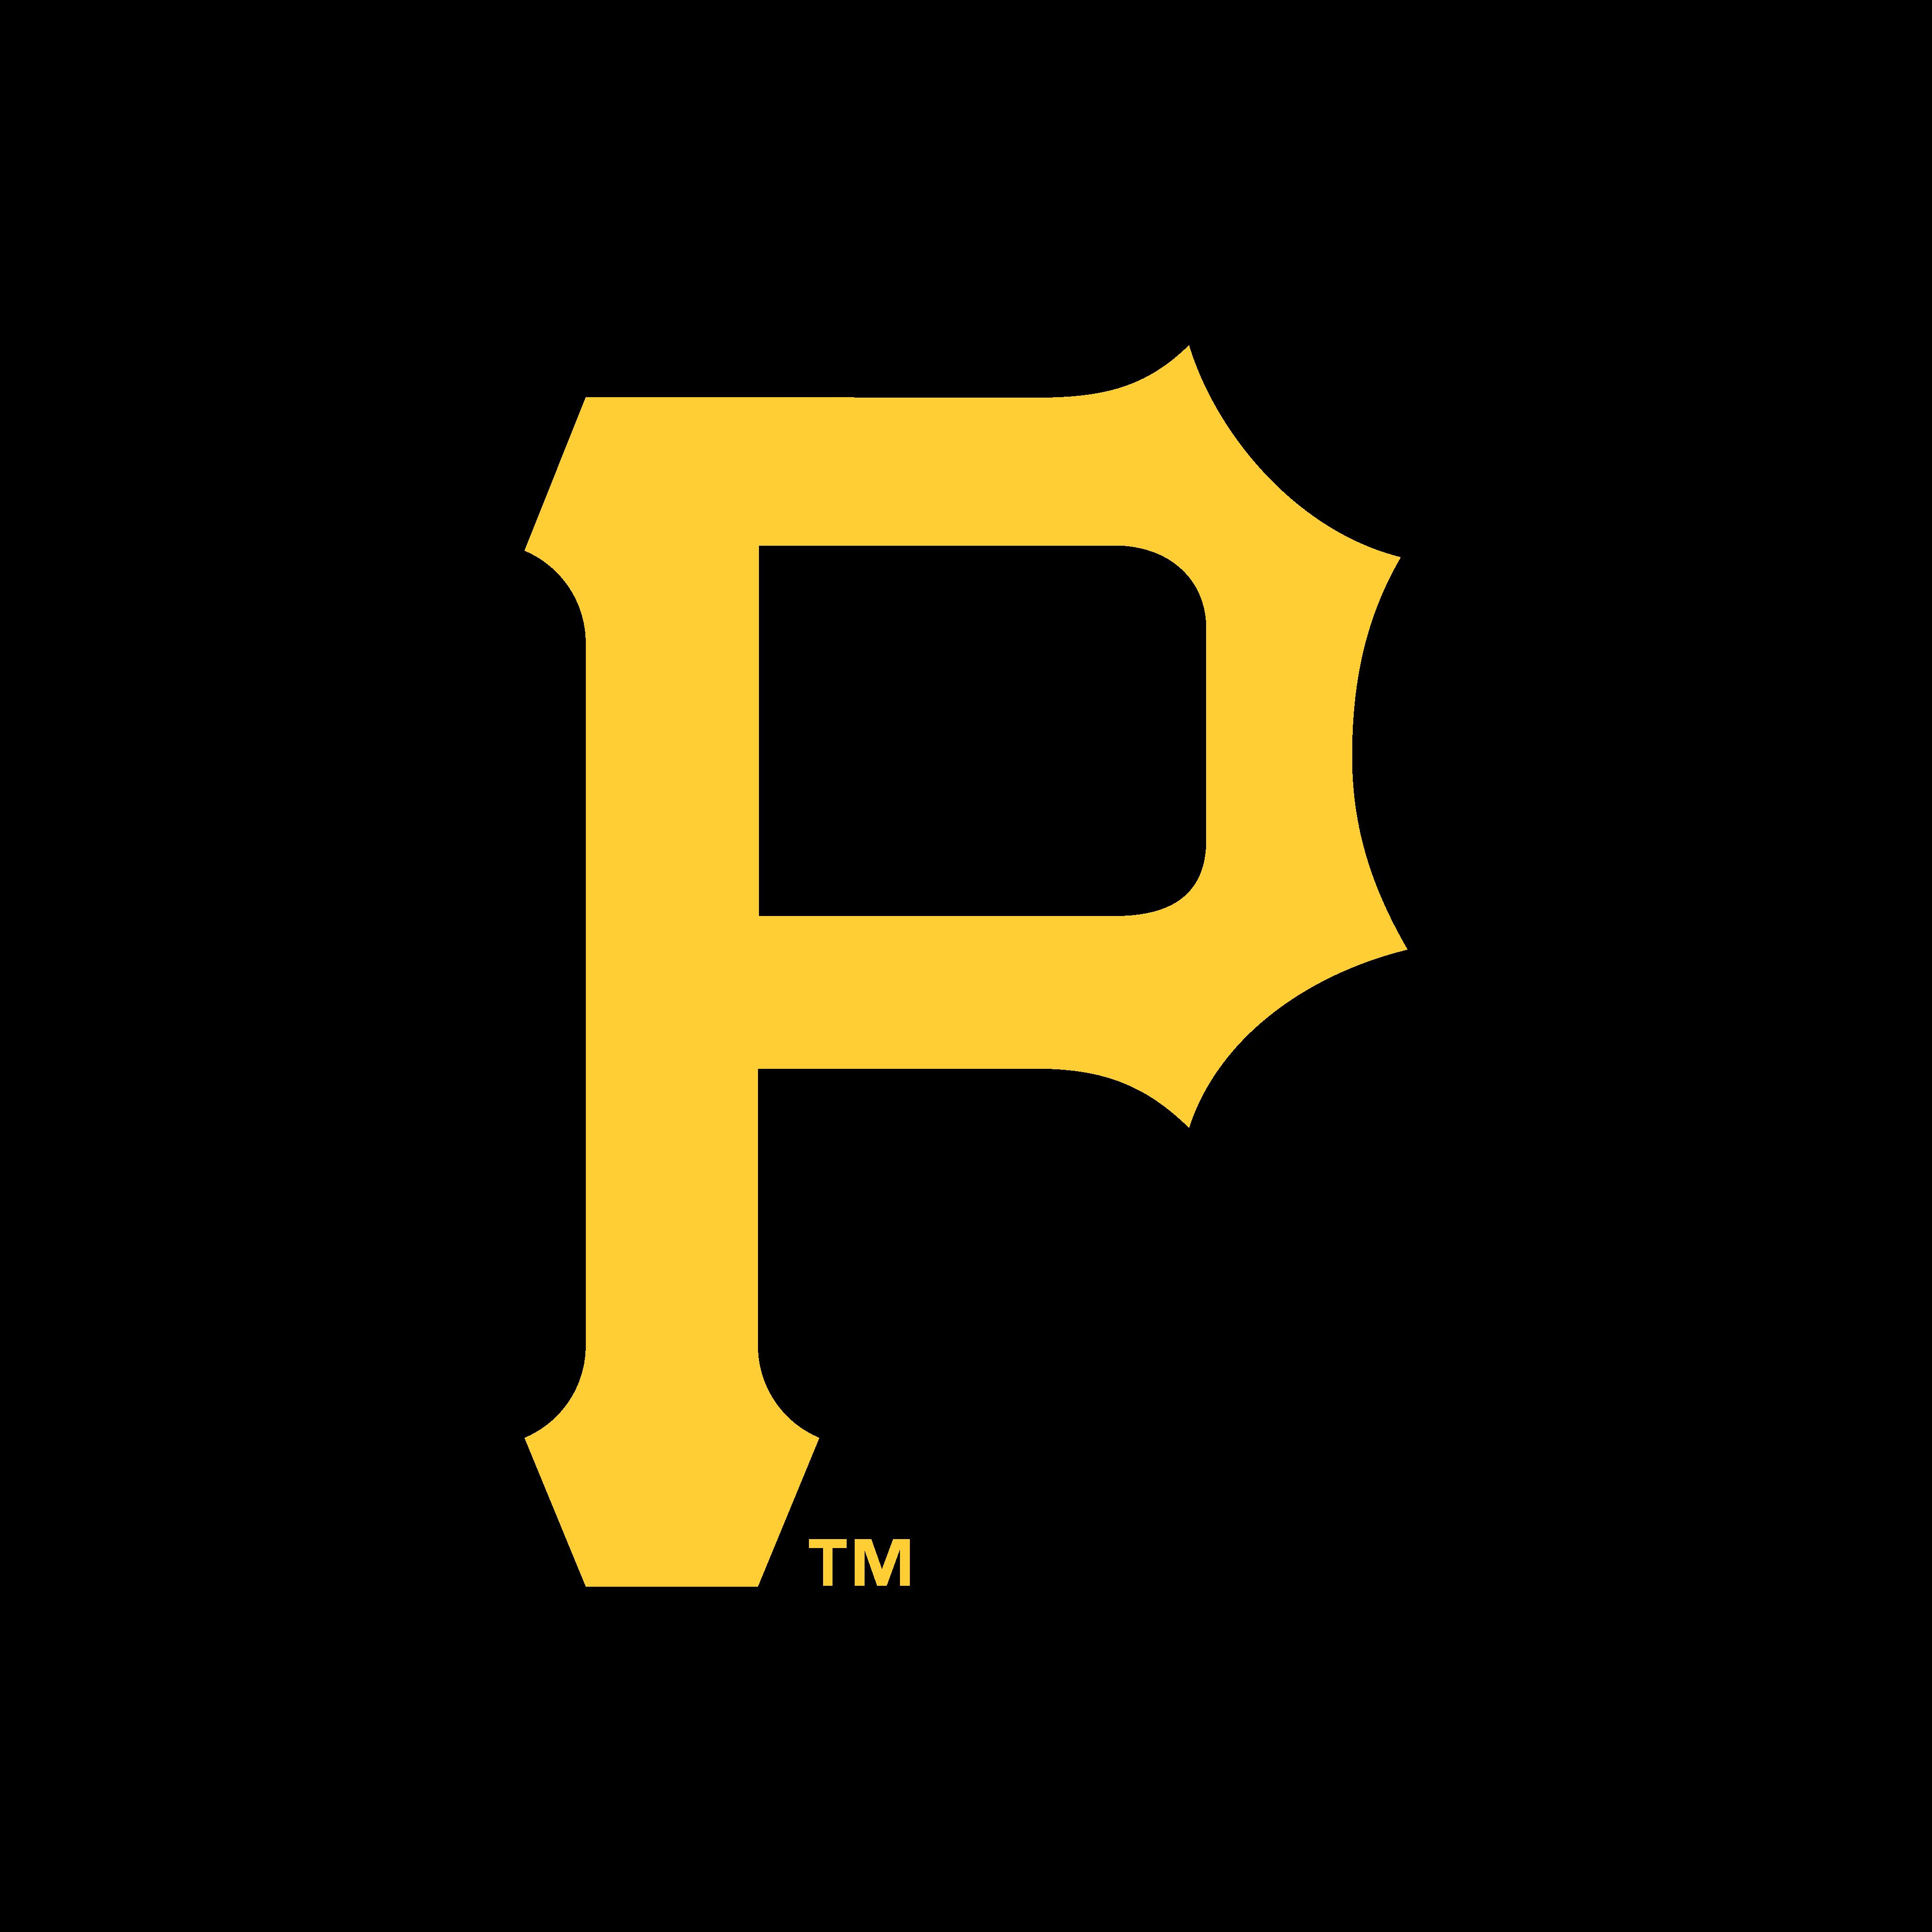 pittsburgh pirates logo 0 - Pittsburgh Pirates Logo